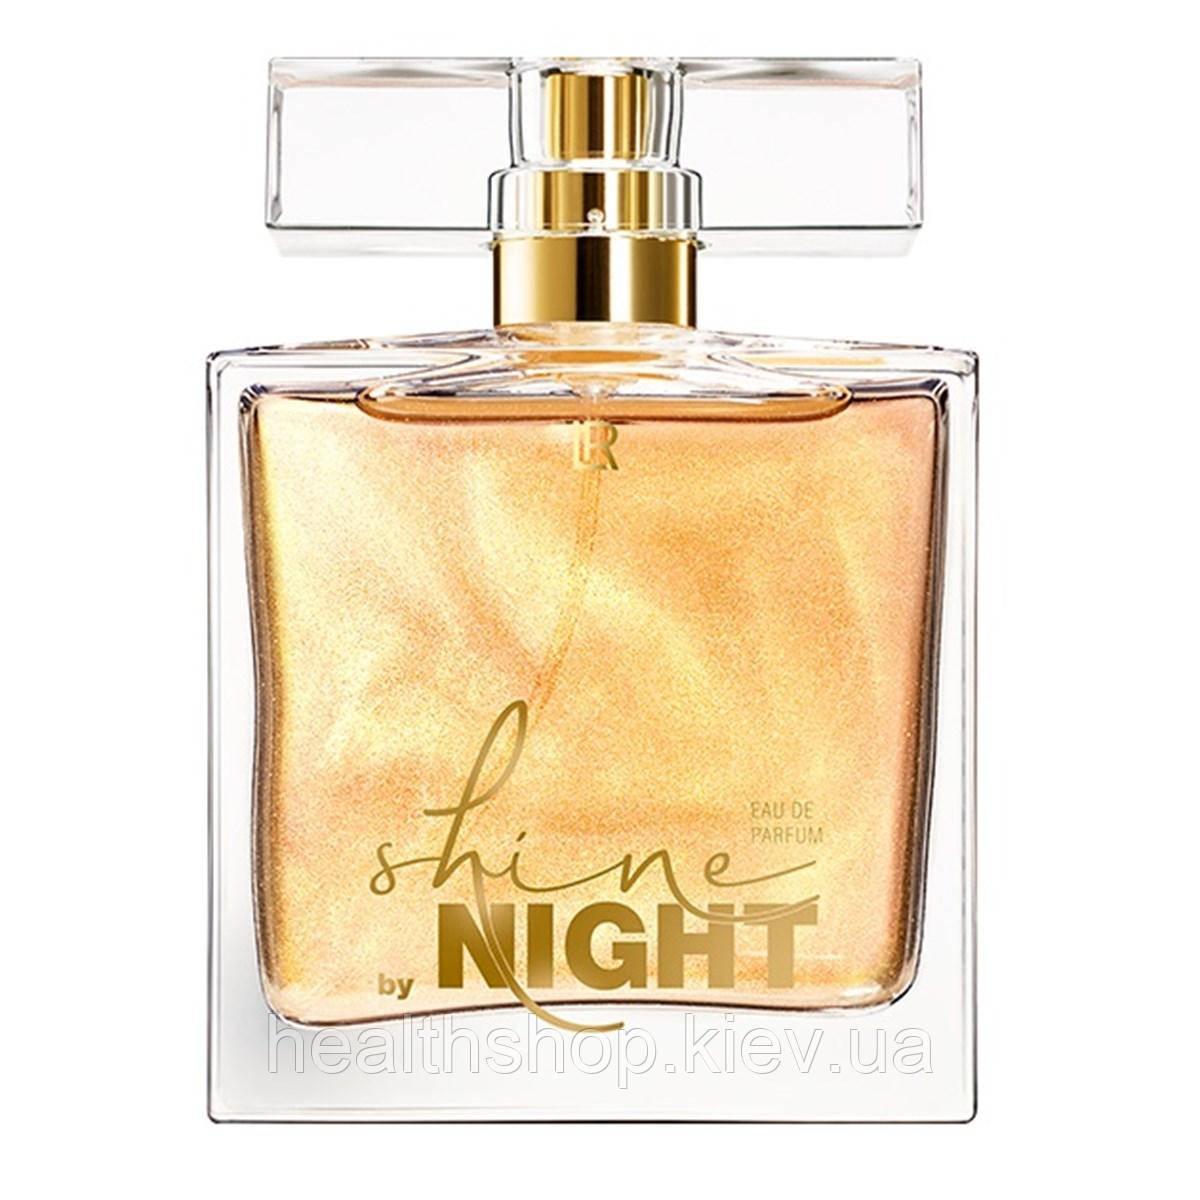 "Парфюмированная вода для женщин ""Shine by Night"" LR 50 мл"